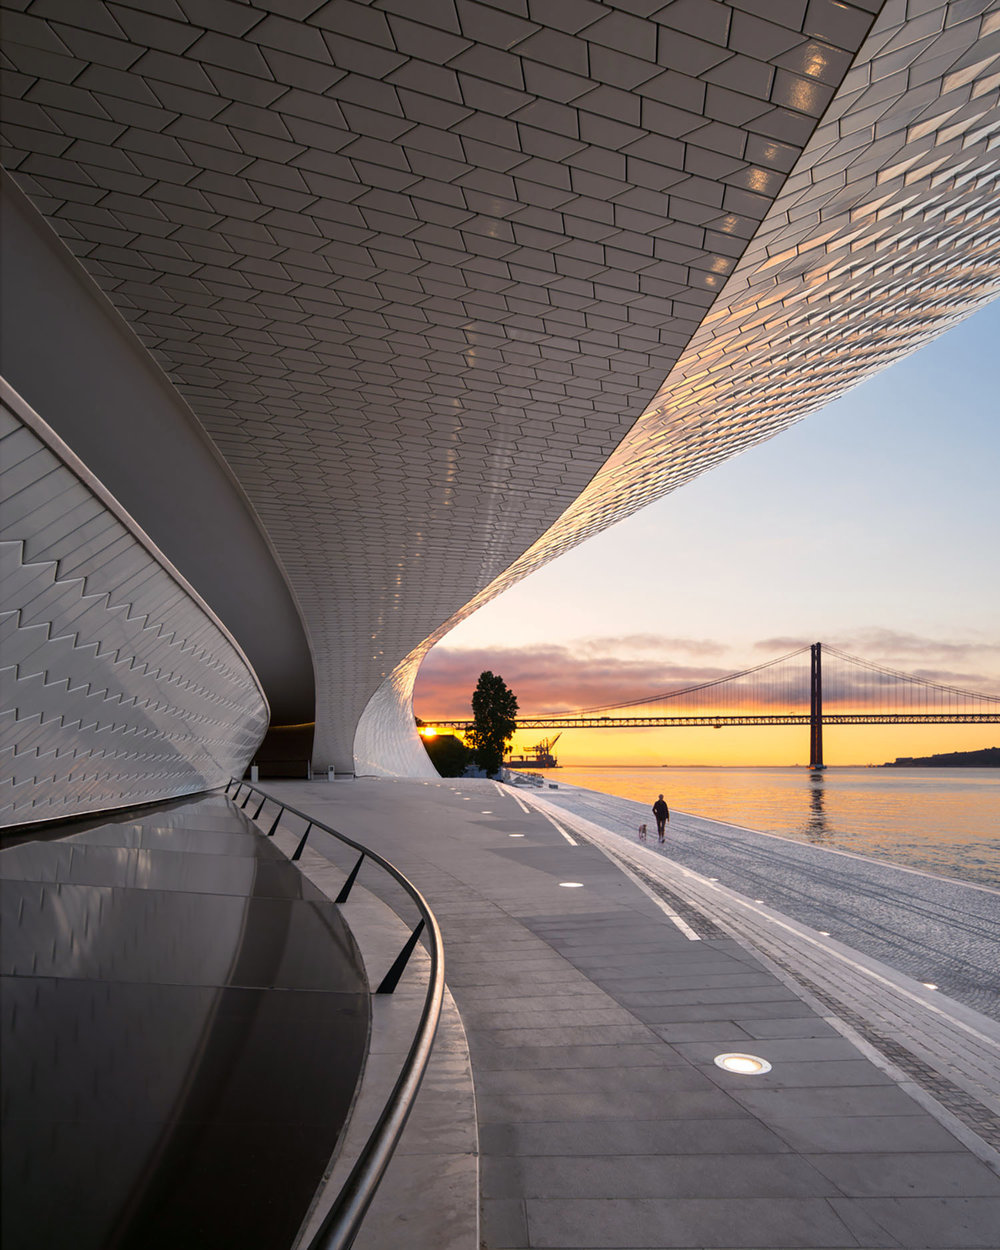 maat-museum-amanda-levete-lisbon-architectural-photographer-12.jpg